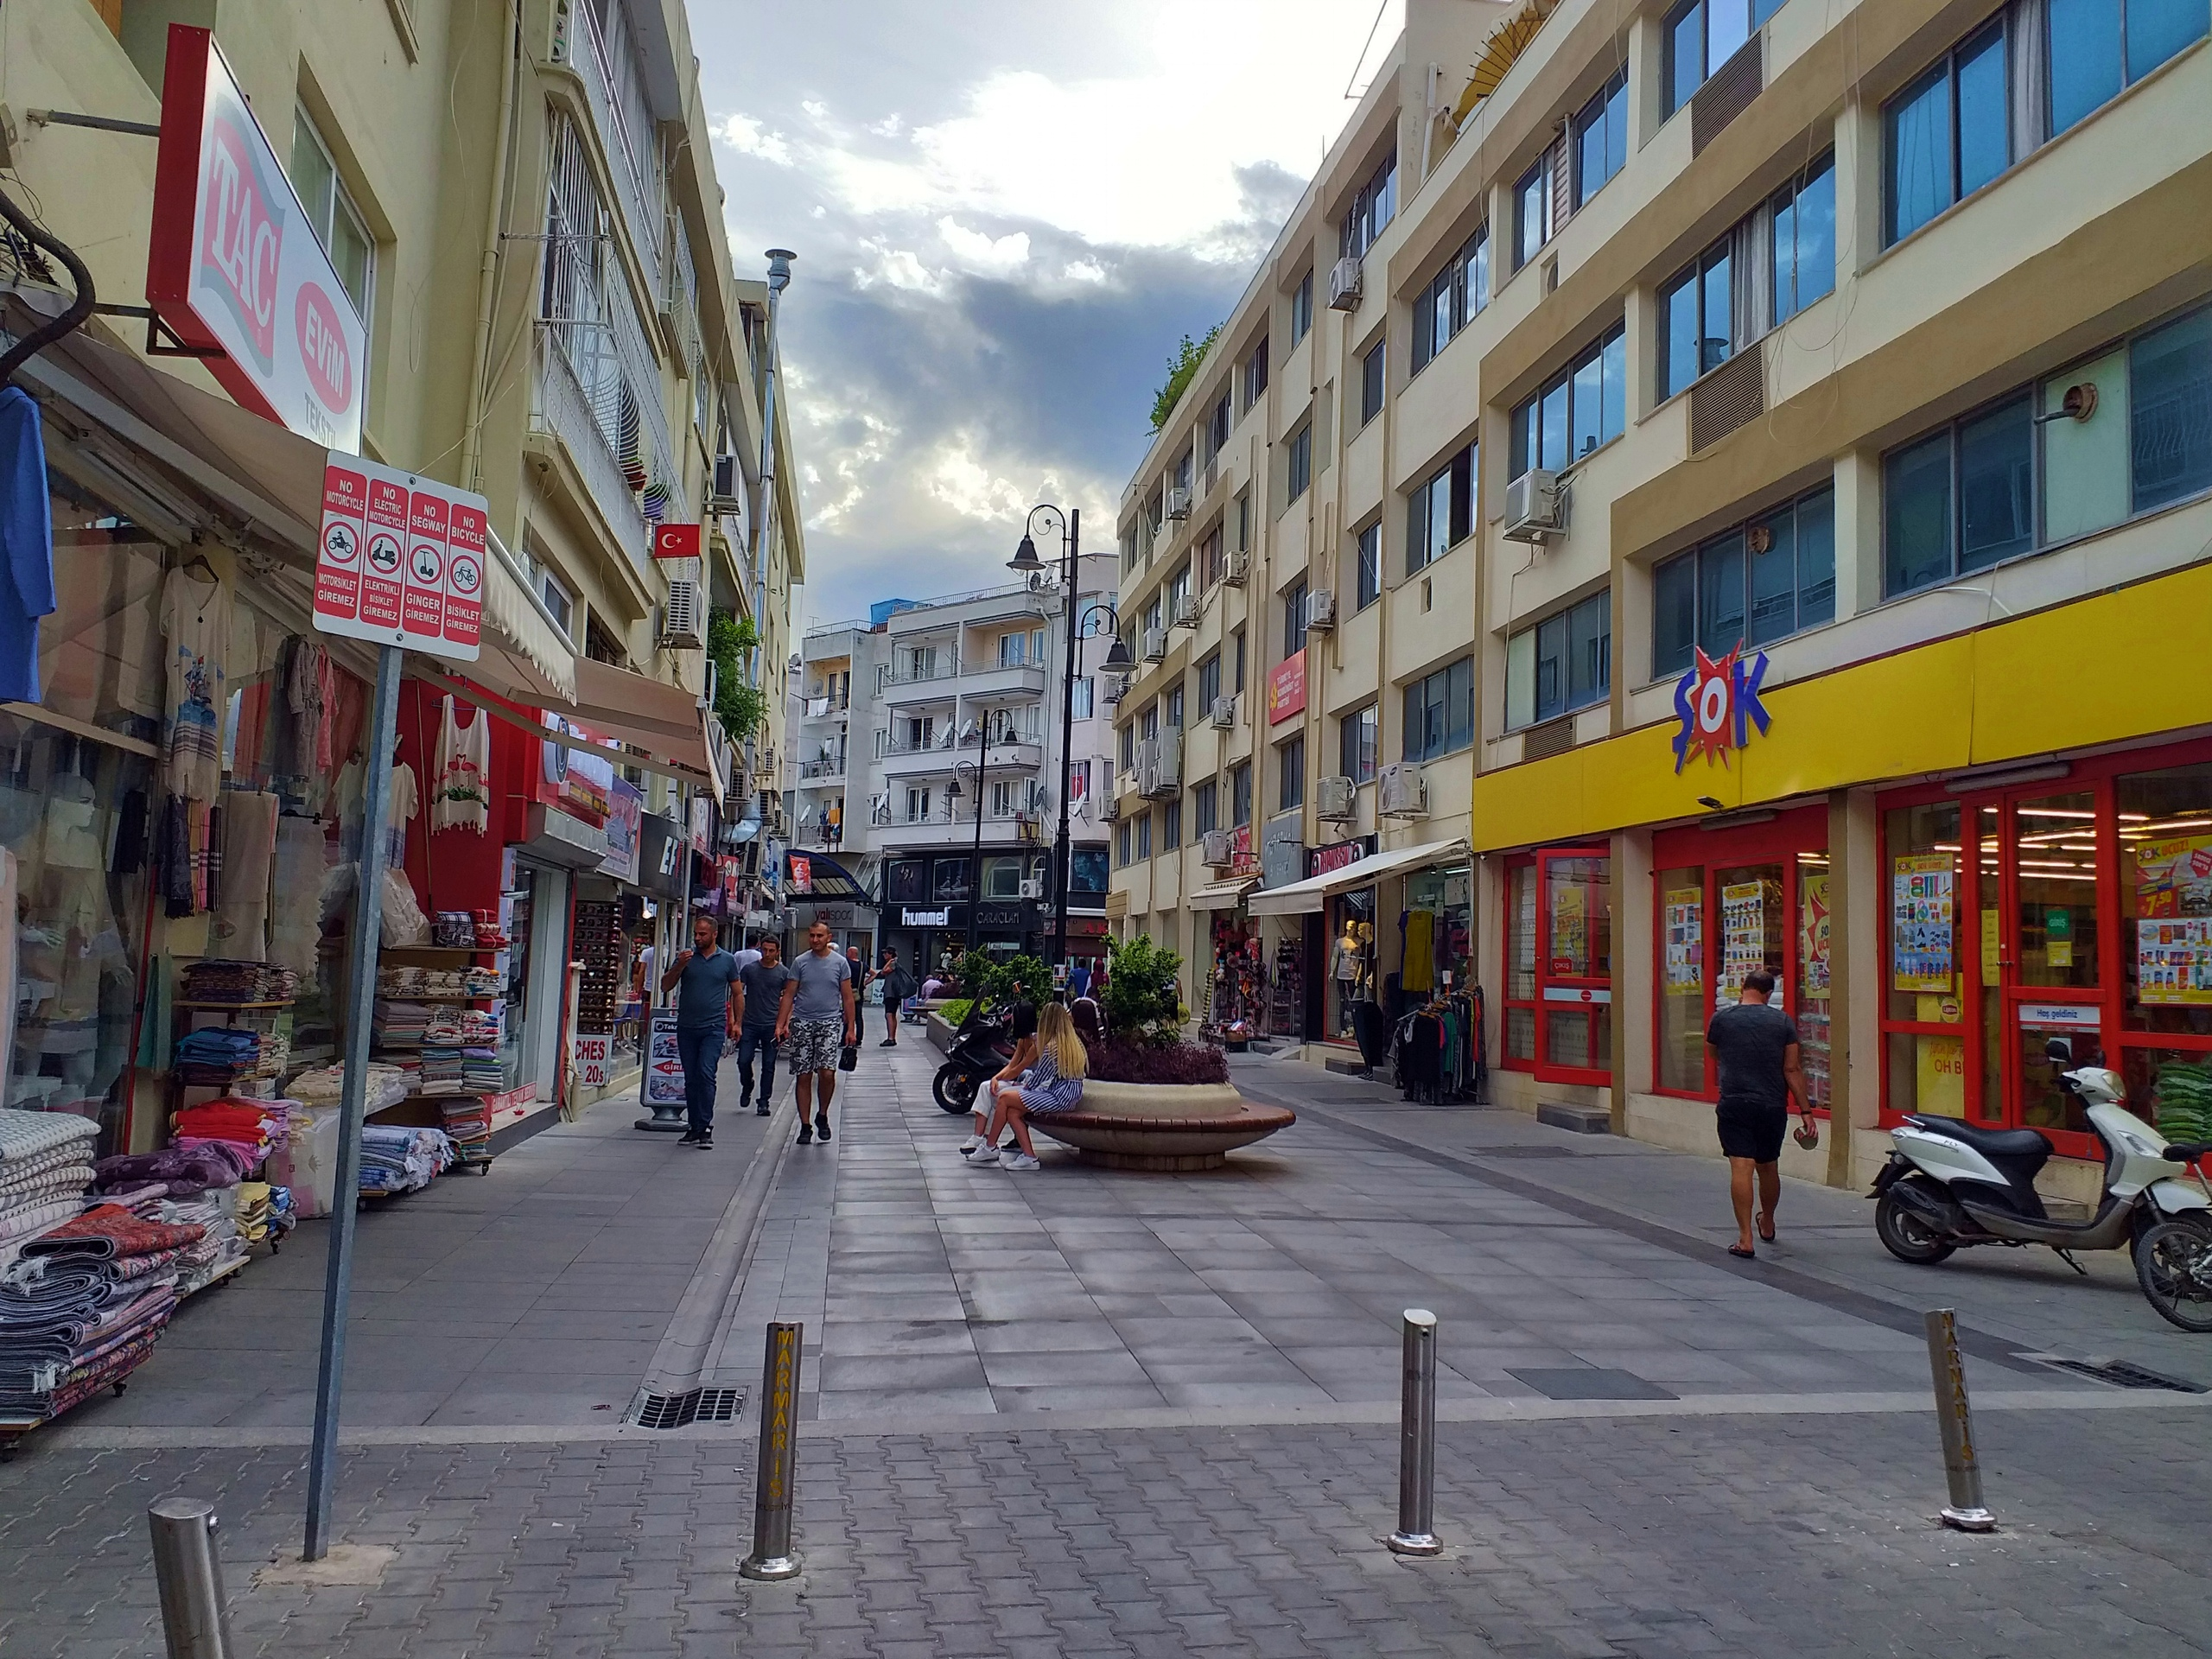 Елена Руденко ( Валтея). Мои путешествия. Турция. Мармарис. (фото ). Ek7rg74zMSo